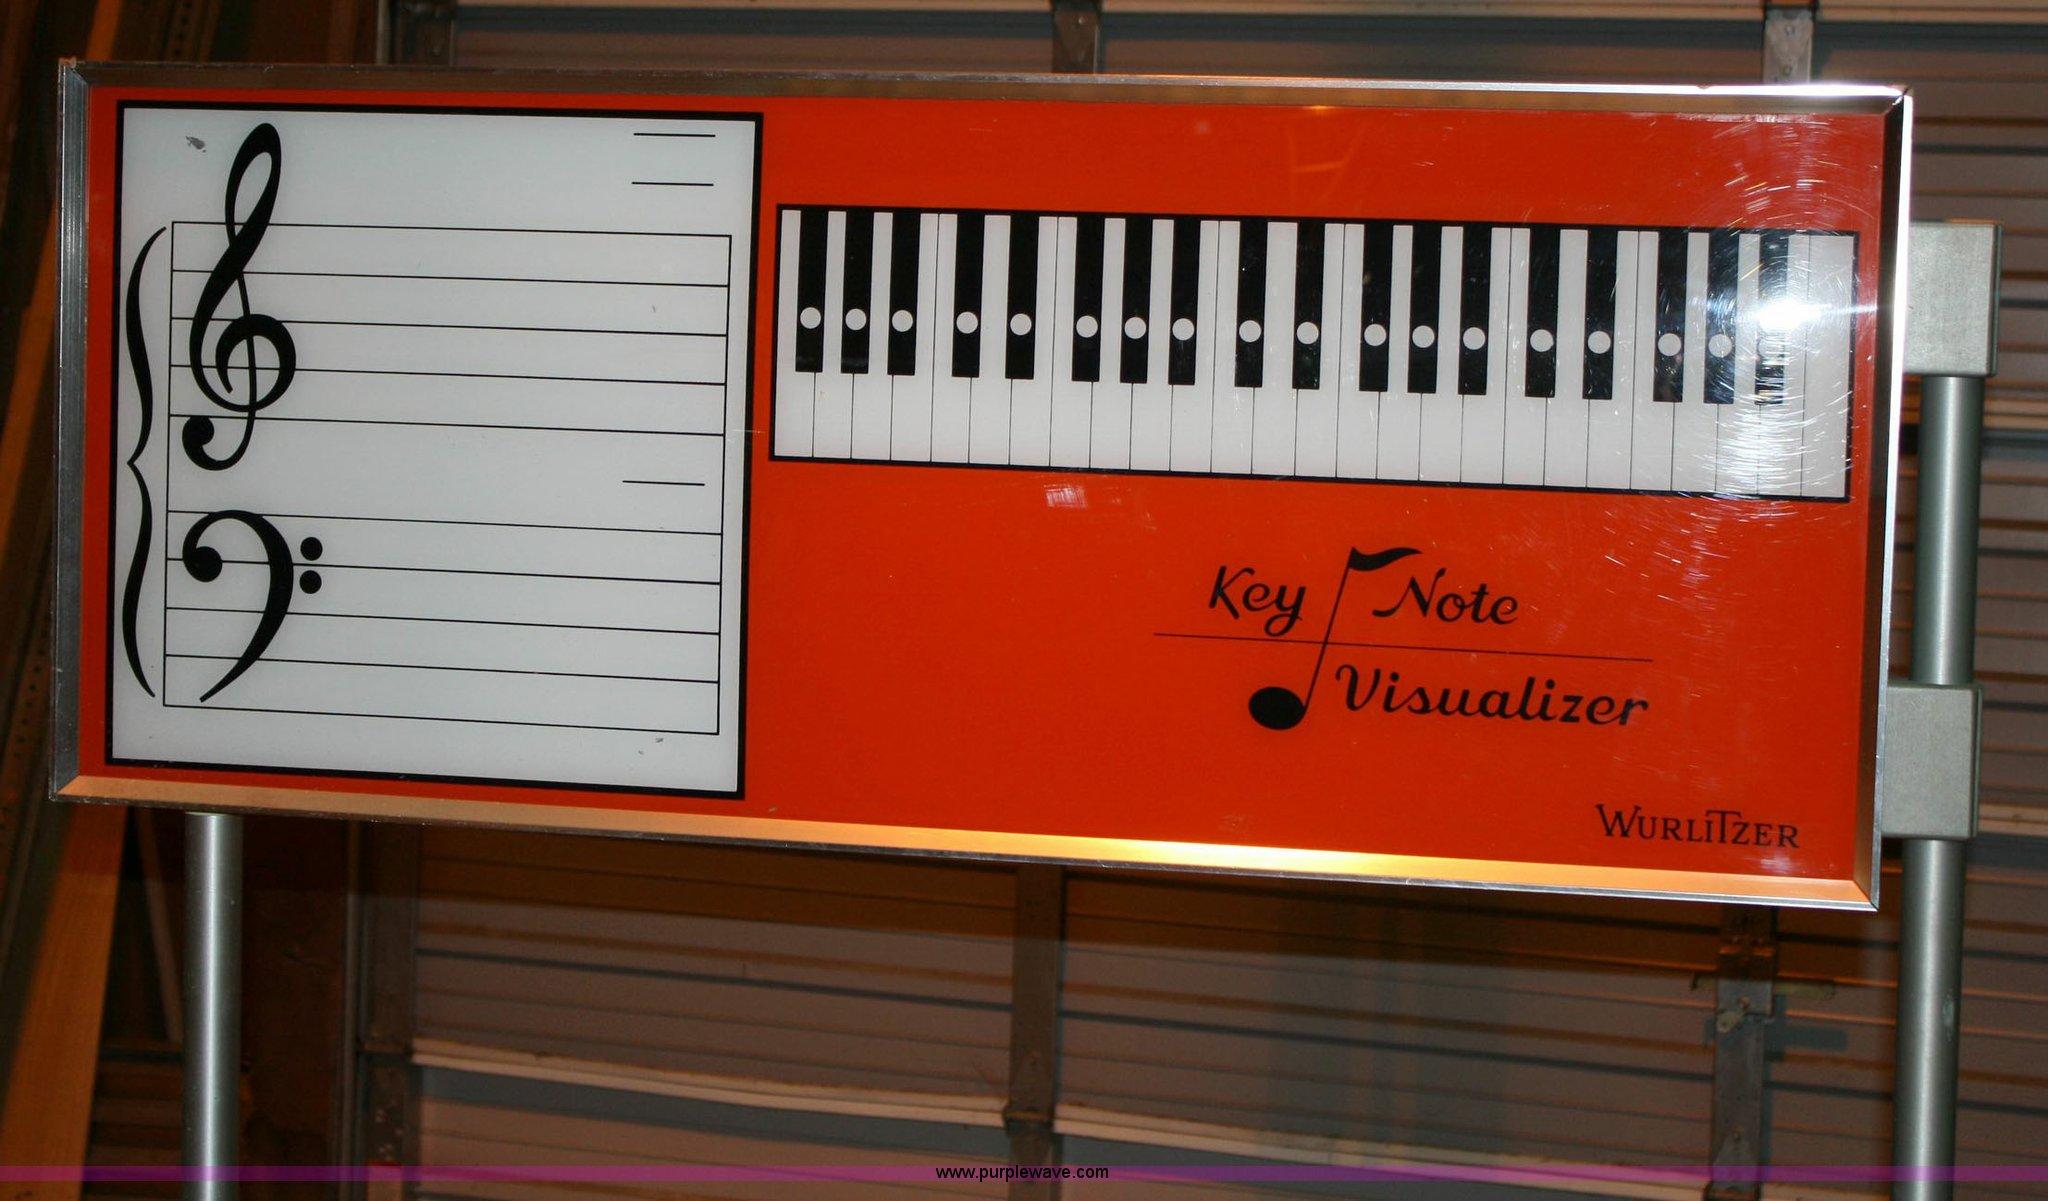 Wurlitzer classroom electric piano with keyboard visualizer